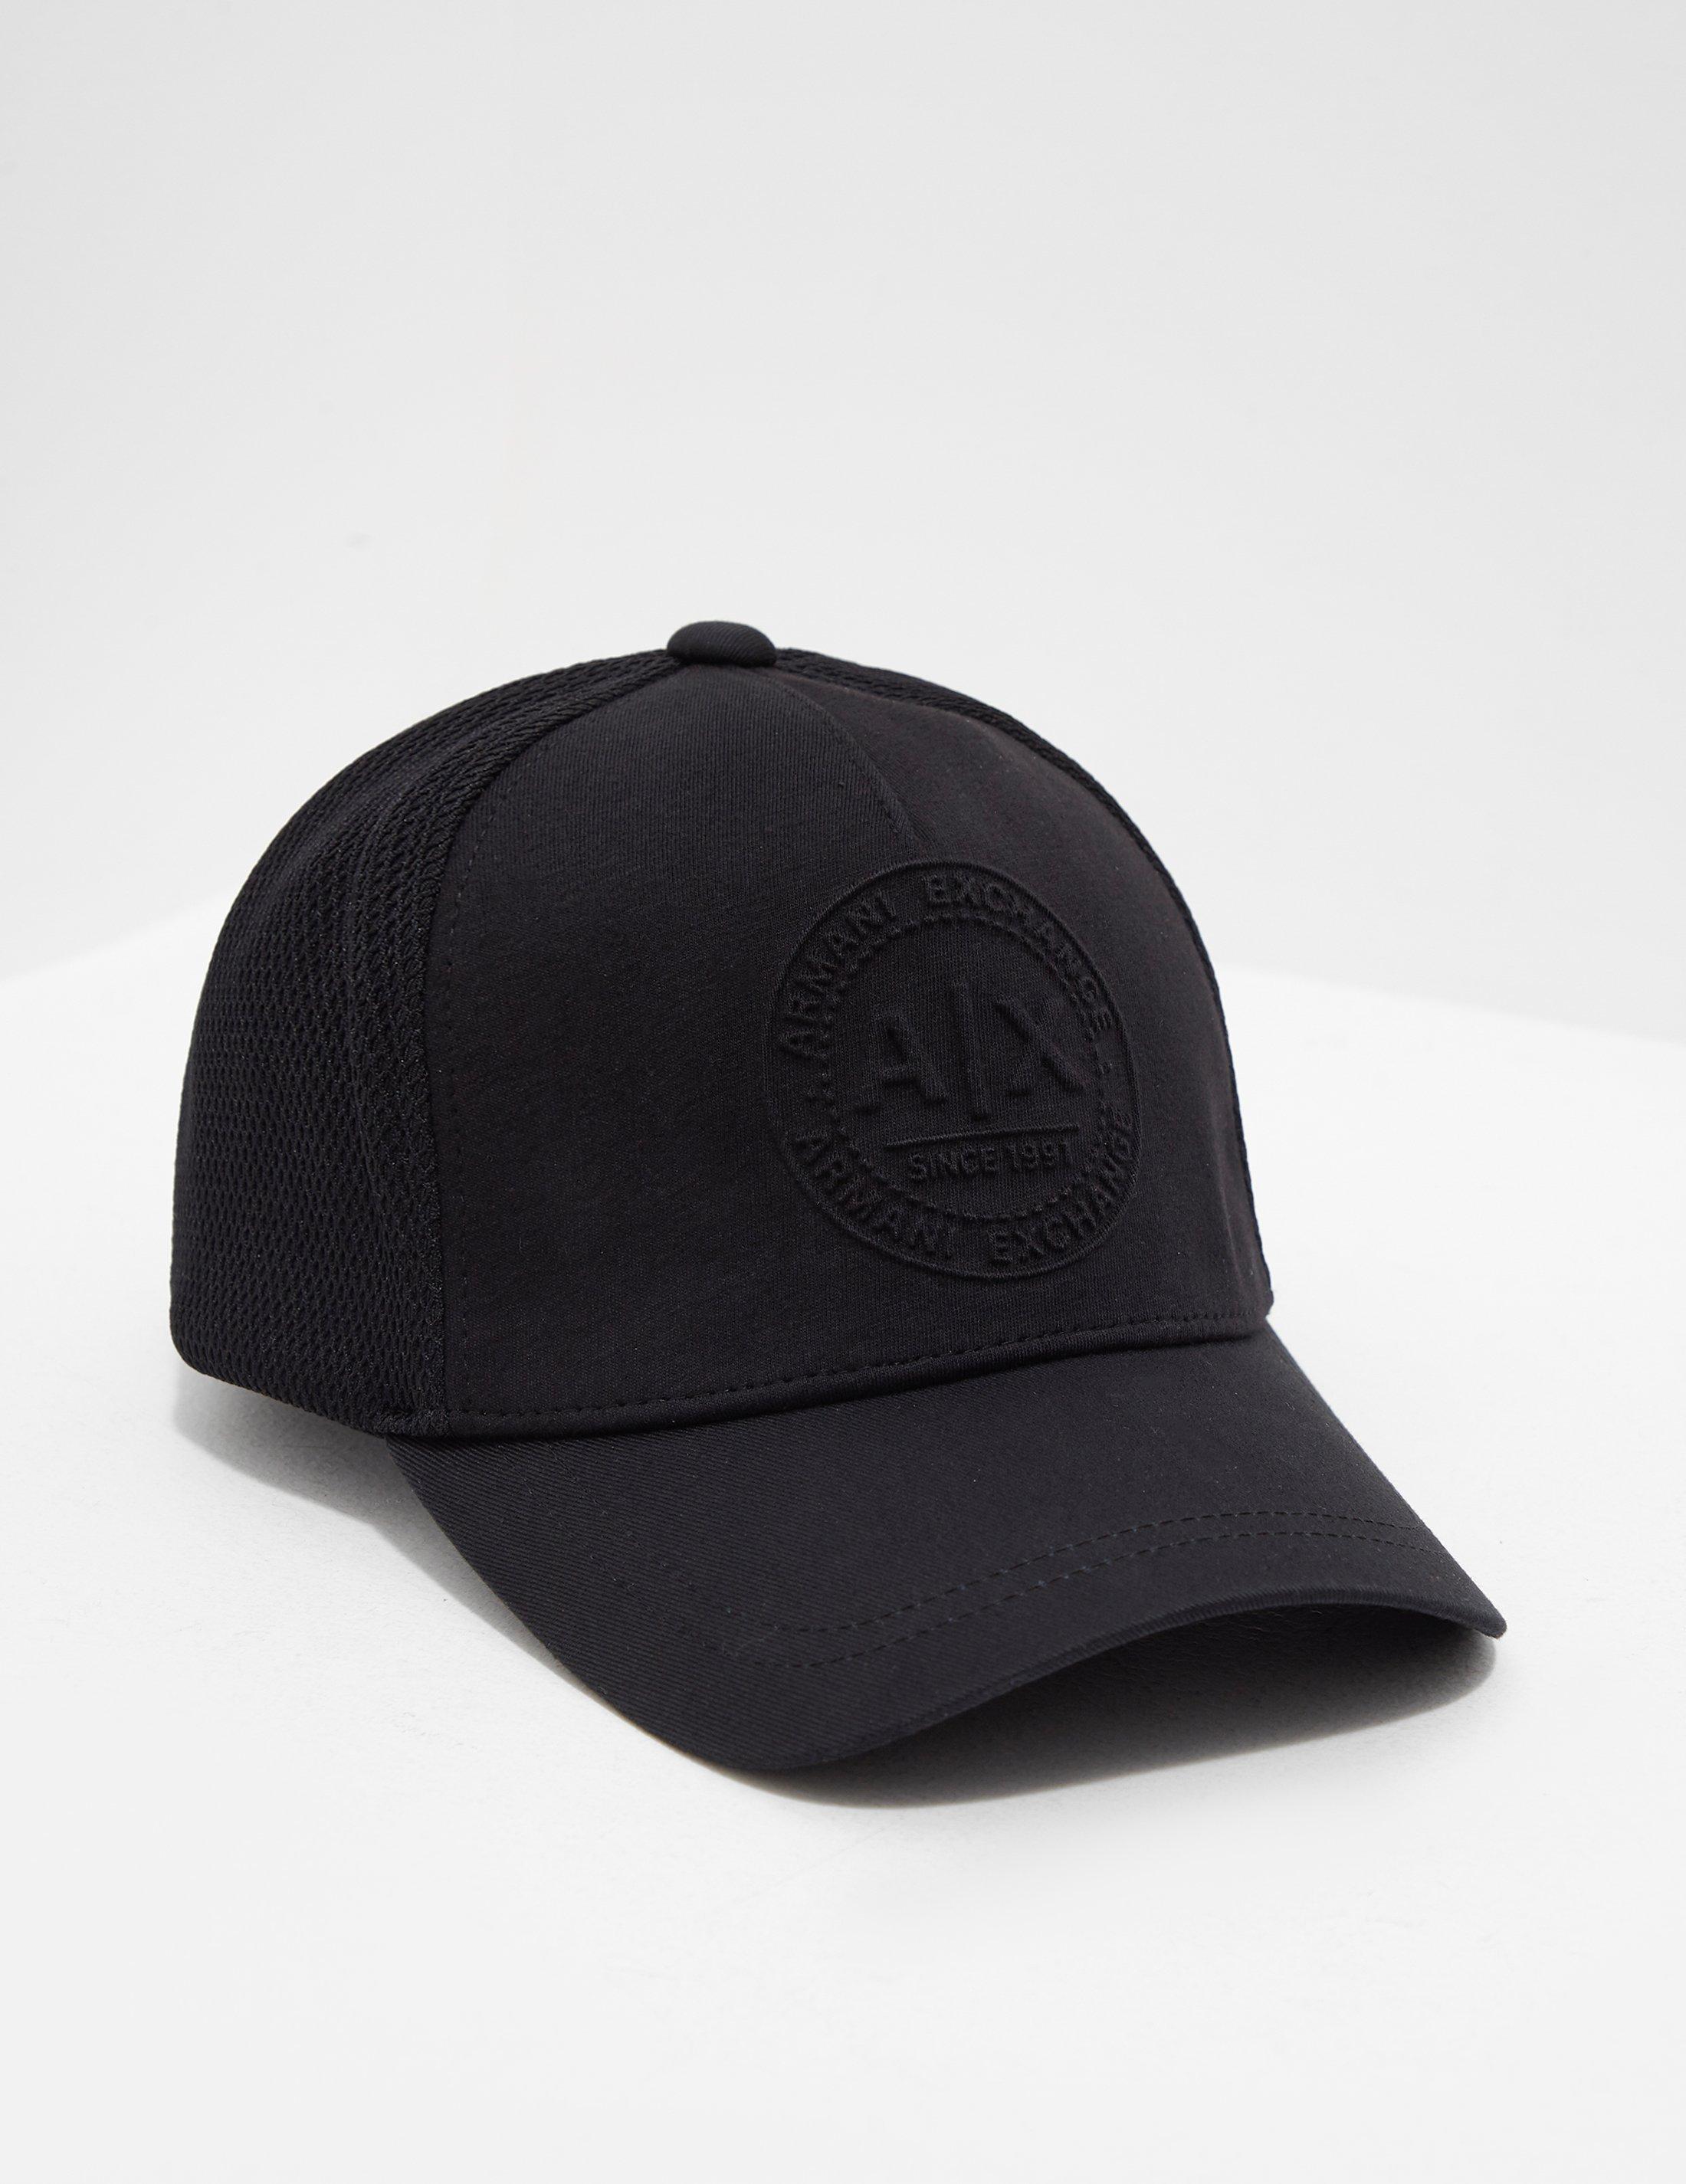 bd1dd166 Lyst - Armani Exchange Embroidered Logo Cap Black in Black for Men